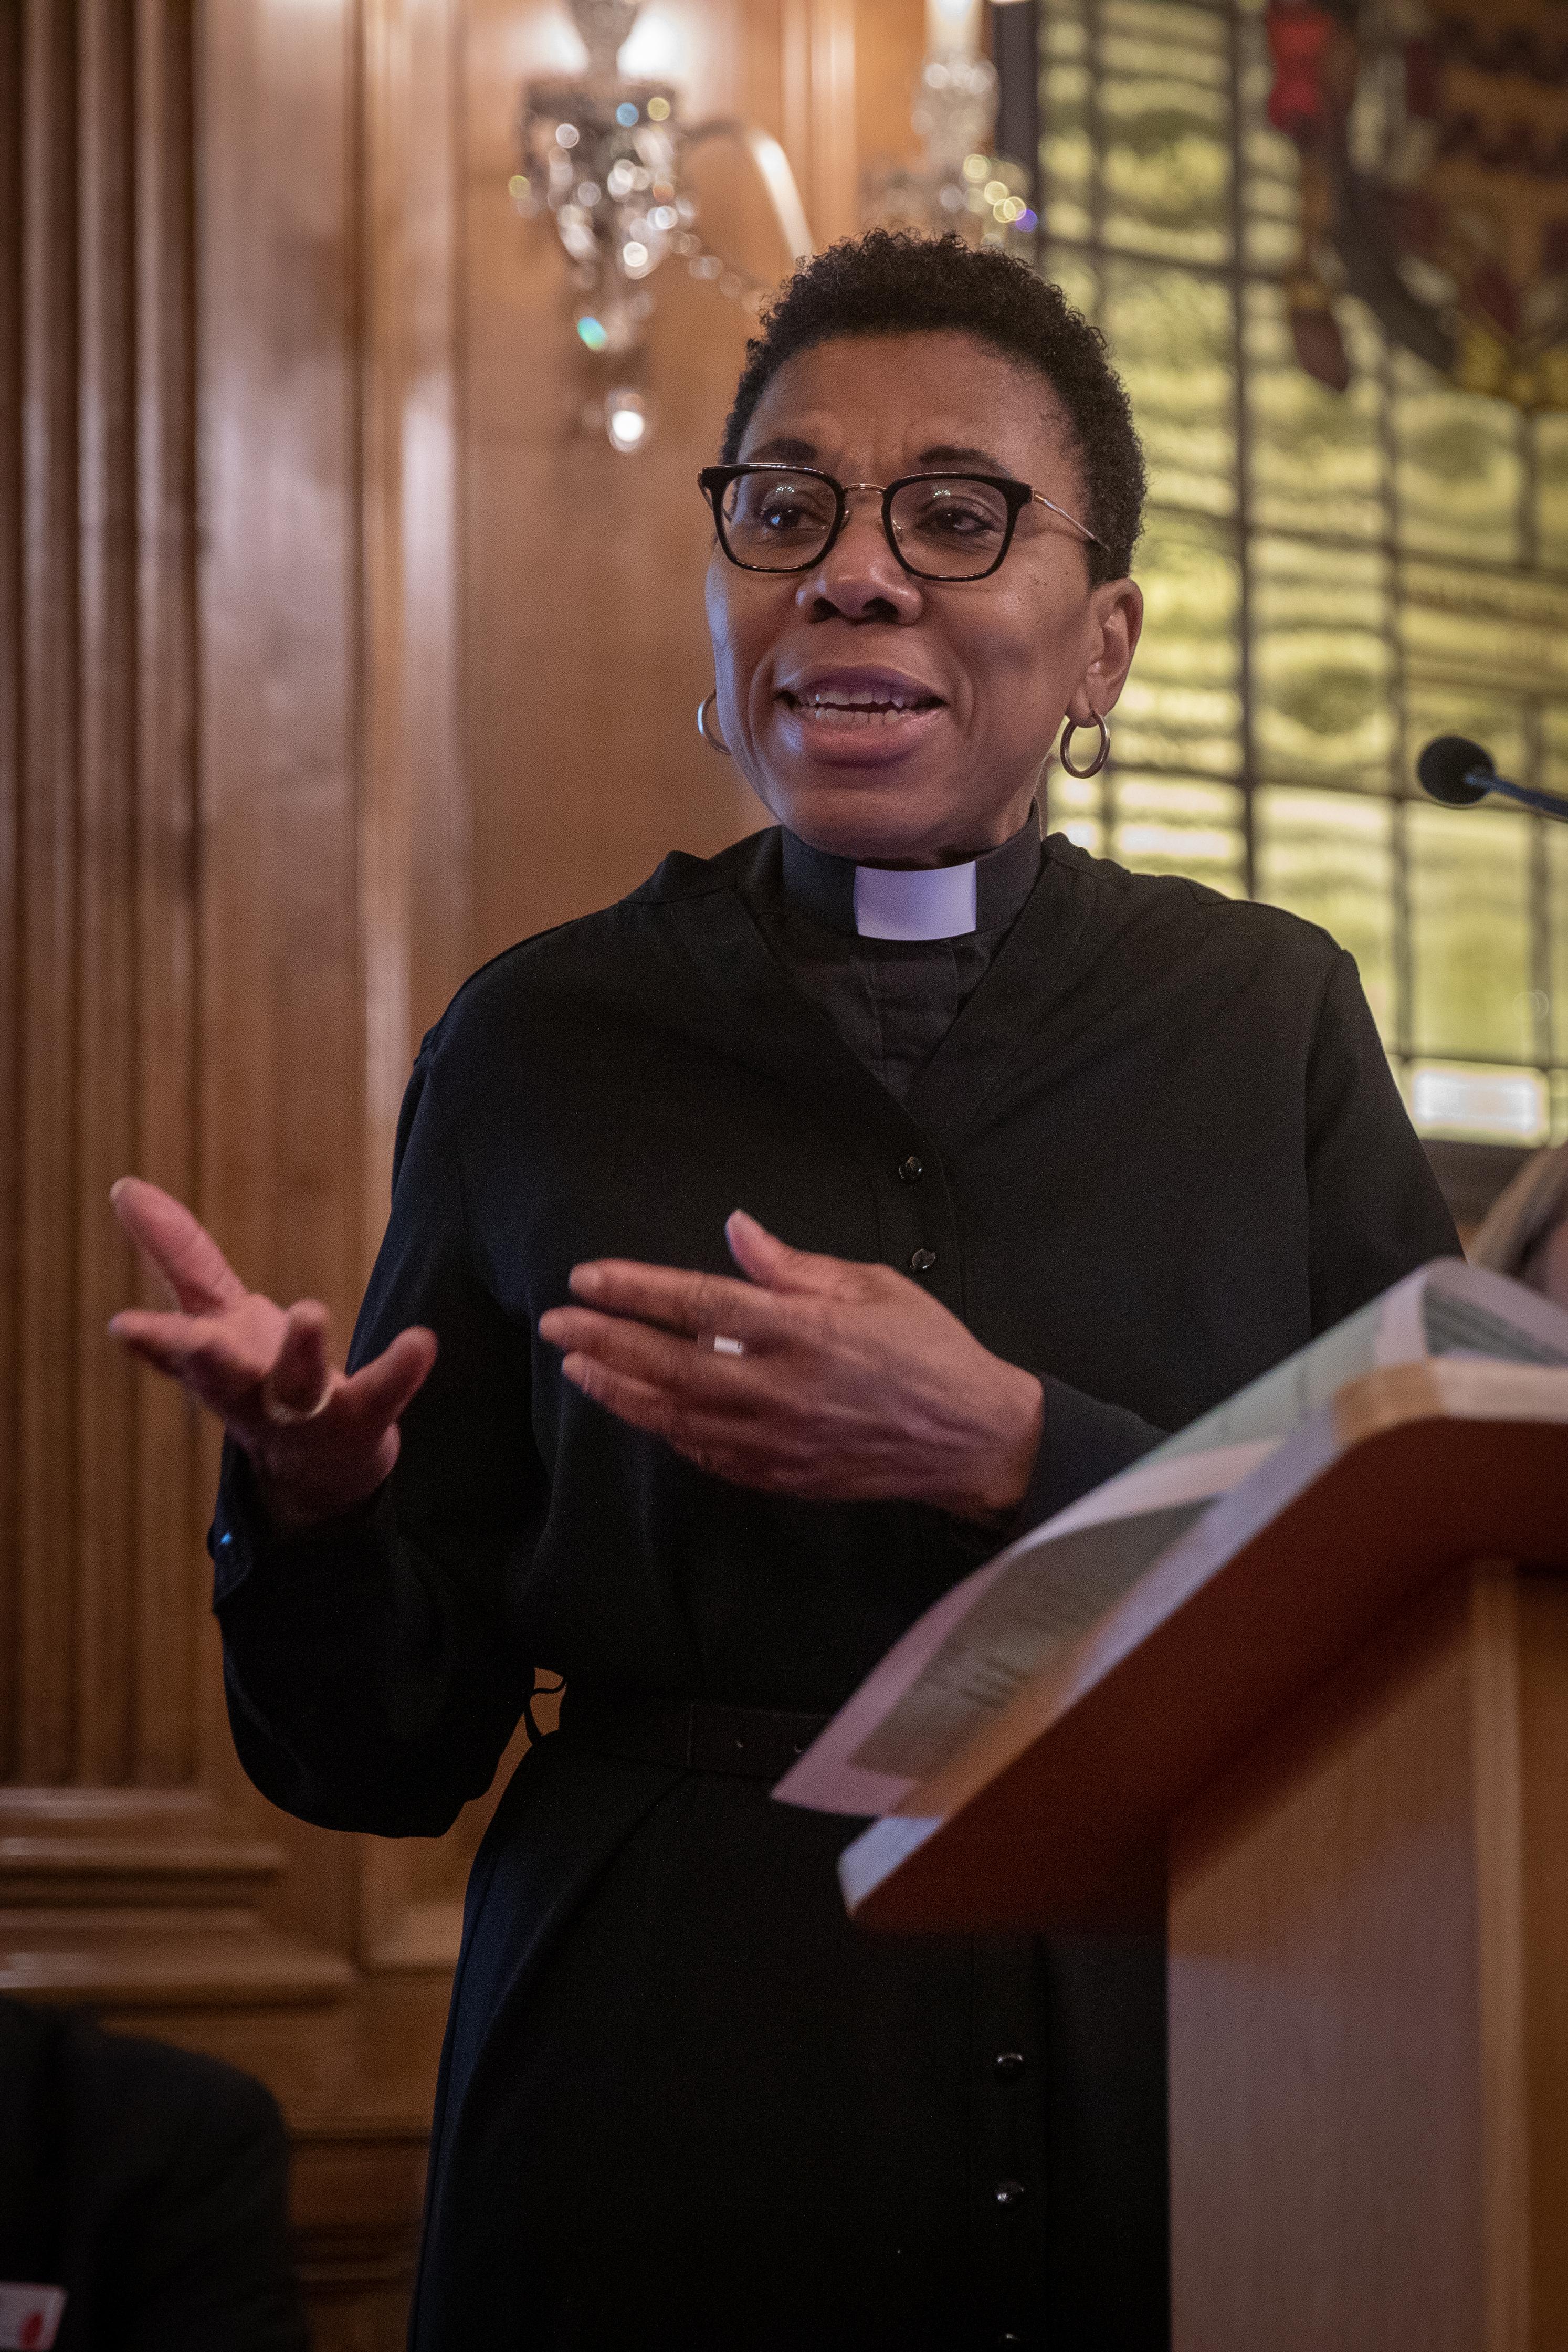 Rev Canon Rosemarie Mallett